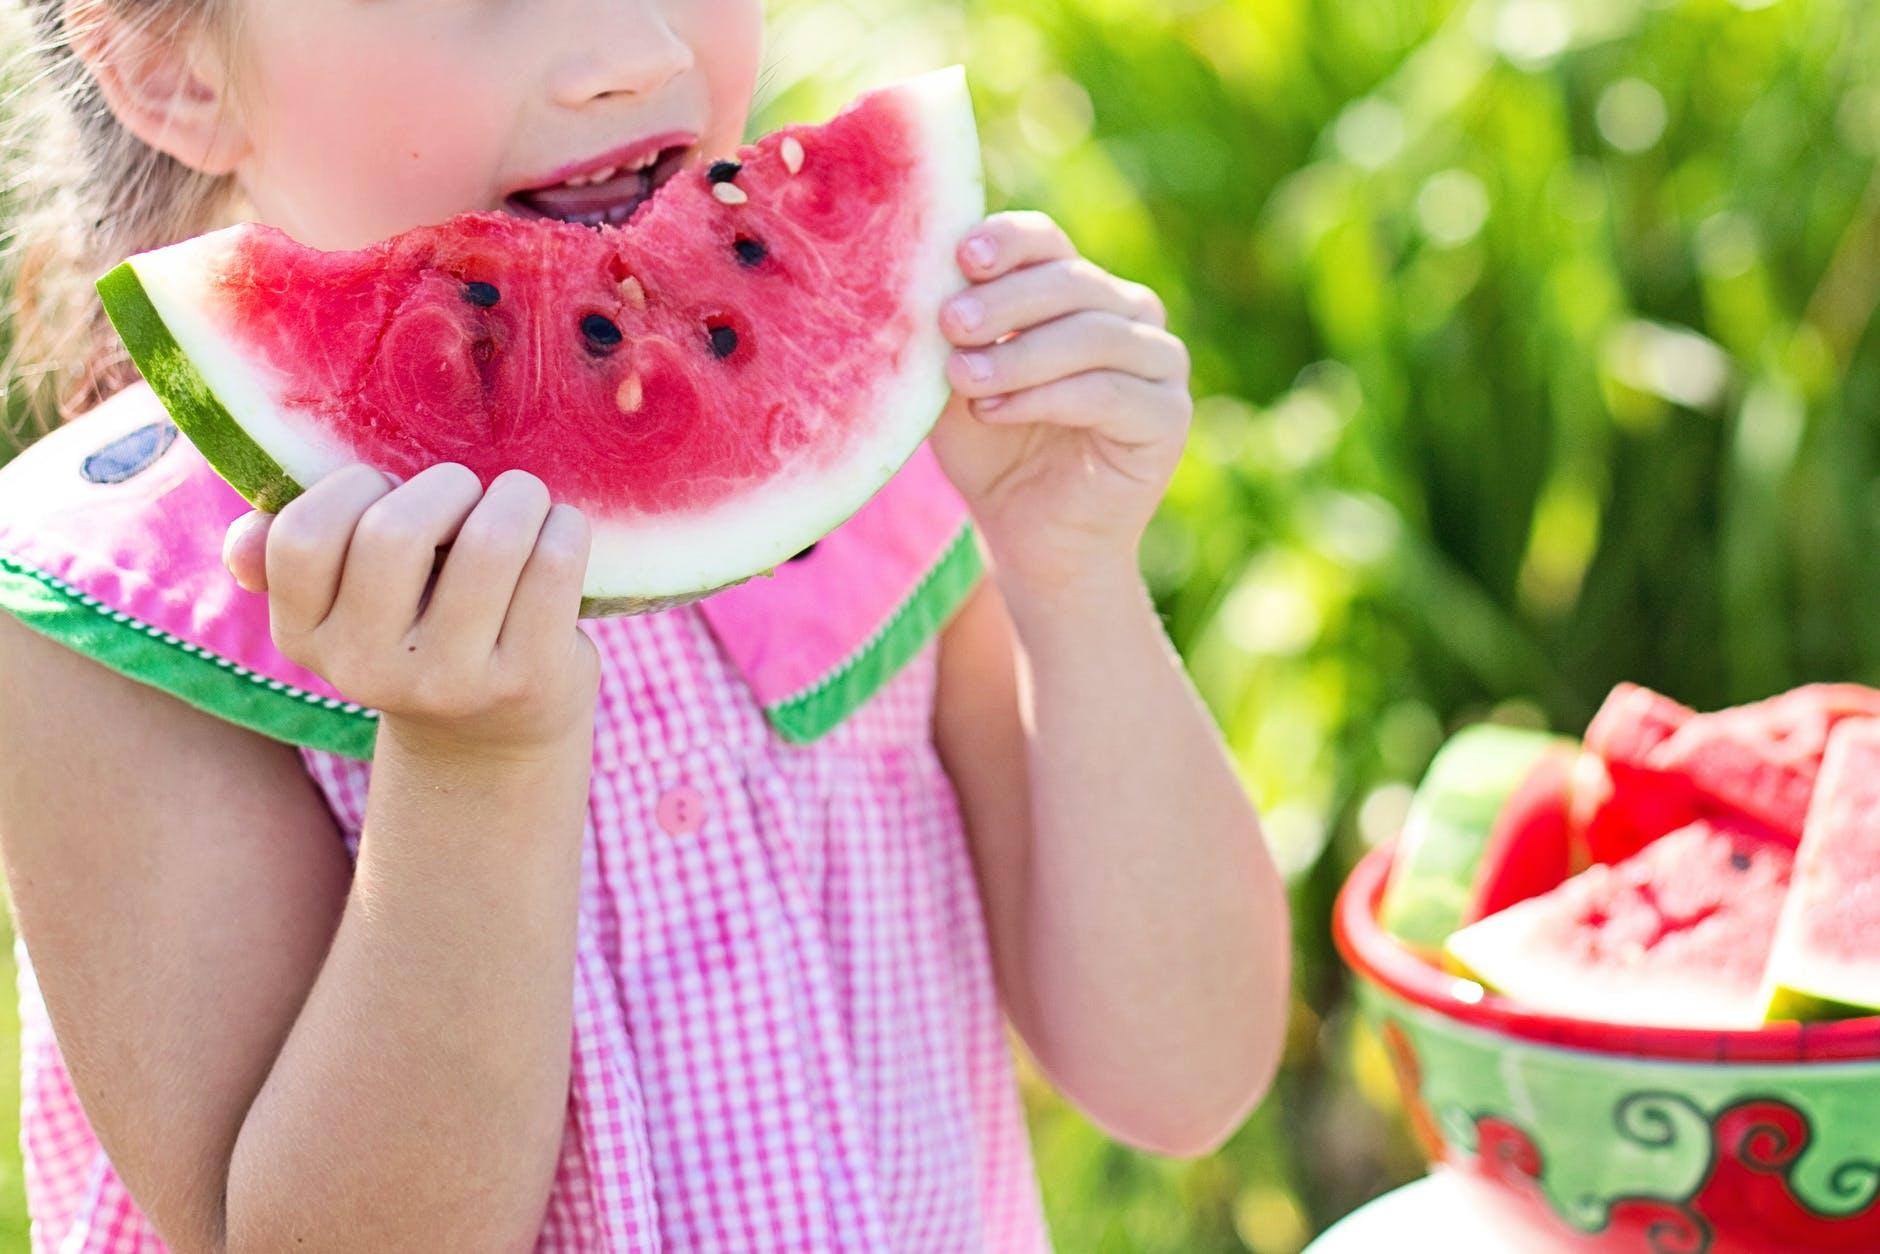 watermelon-summer-little-girl-eating-watermelon-food.jpg